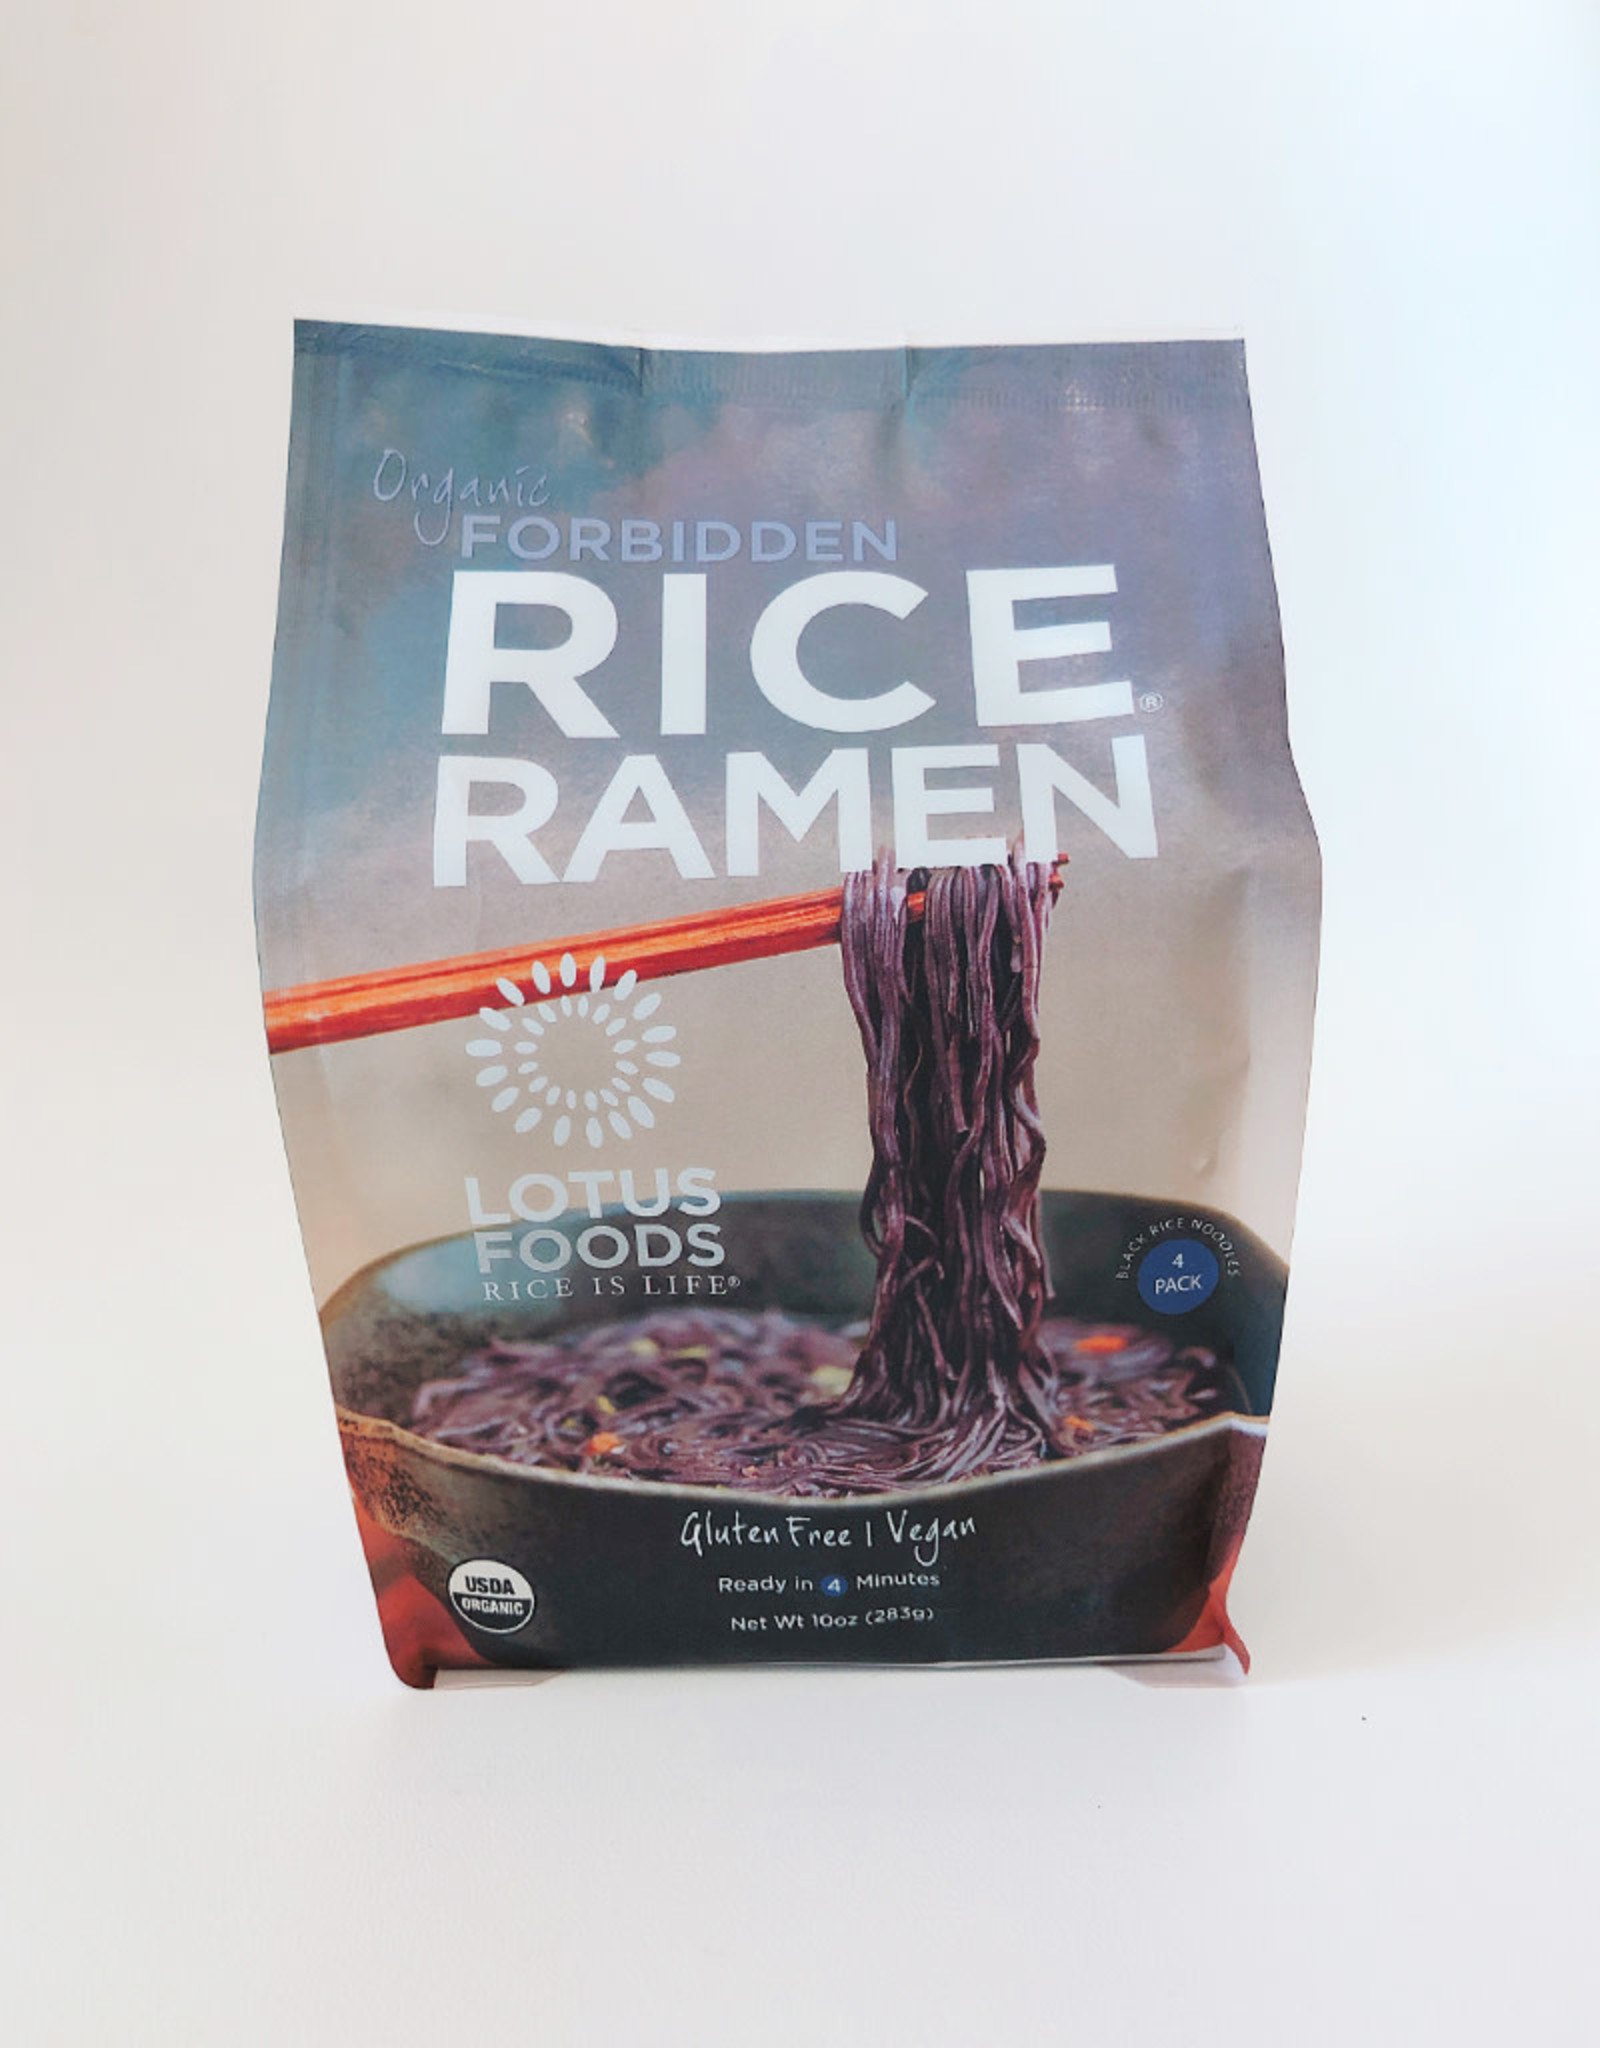 Lotus Foods Lotus Foods - Organic Rice Ramen 4 Pack, Forbidden Black Rice